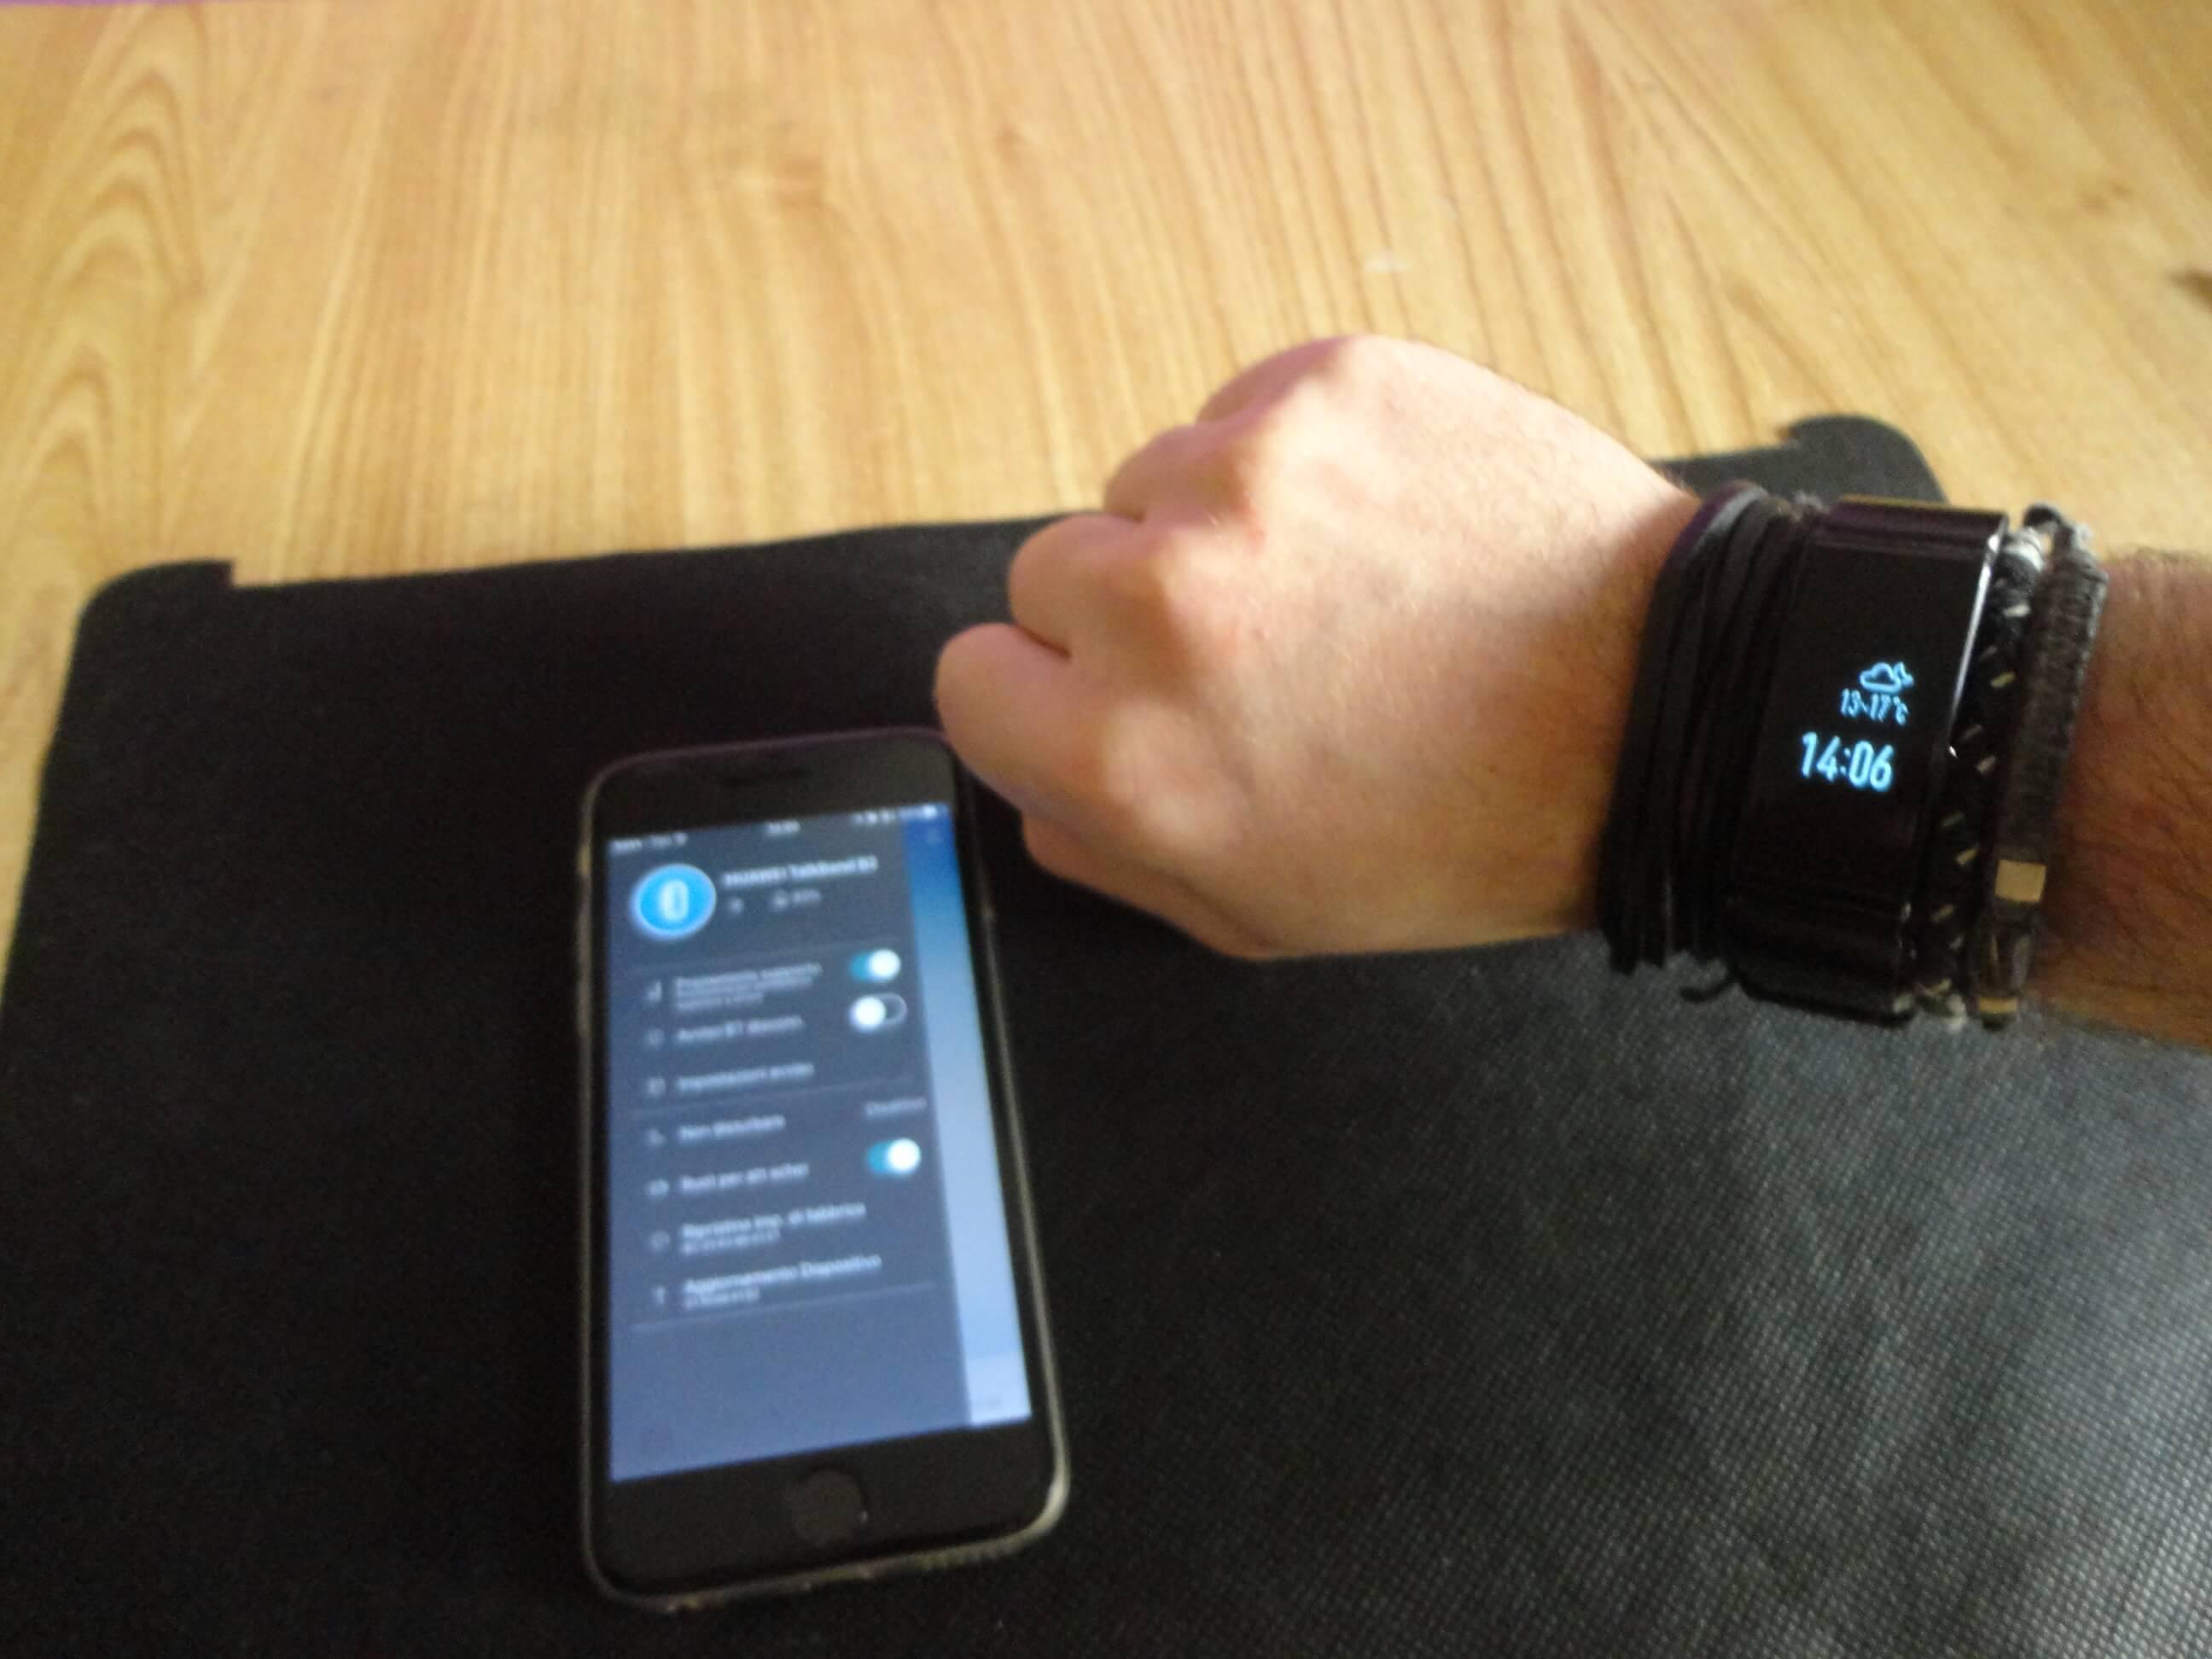 Huawei Talkband B2 app